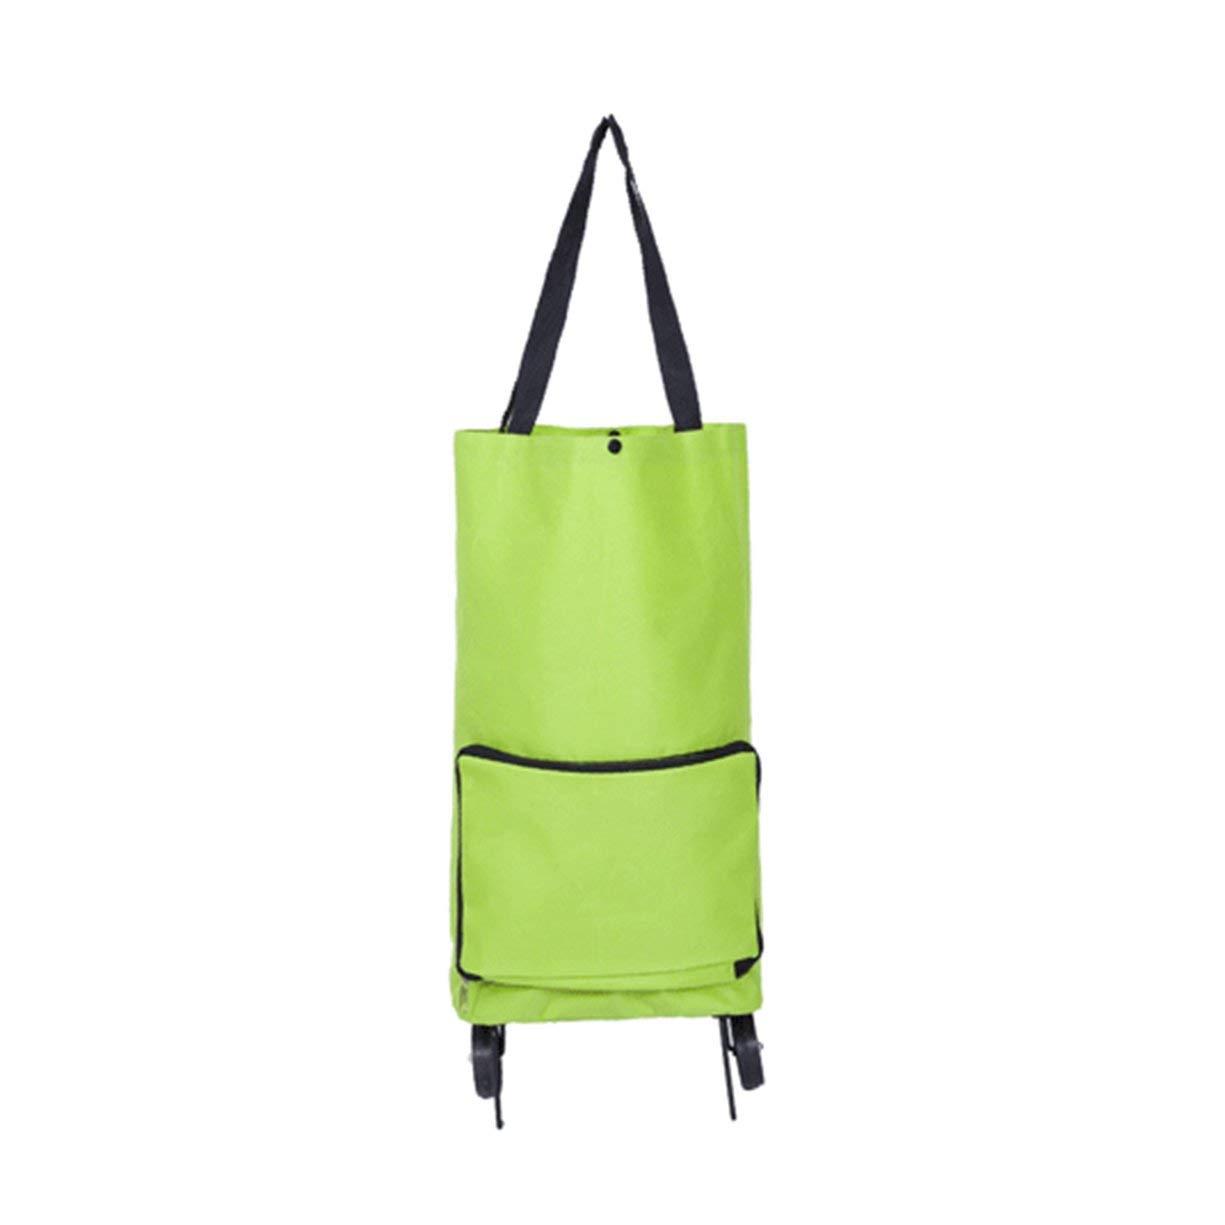 Shopping Trolley Wheel Bag,Multifunctional Waterproof Oxford Cloth Foldable Supermarker Shopping Trolley Wheel Bag Traval Cart Luggage Bag